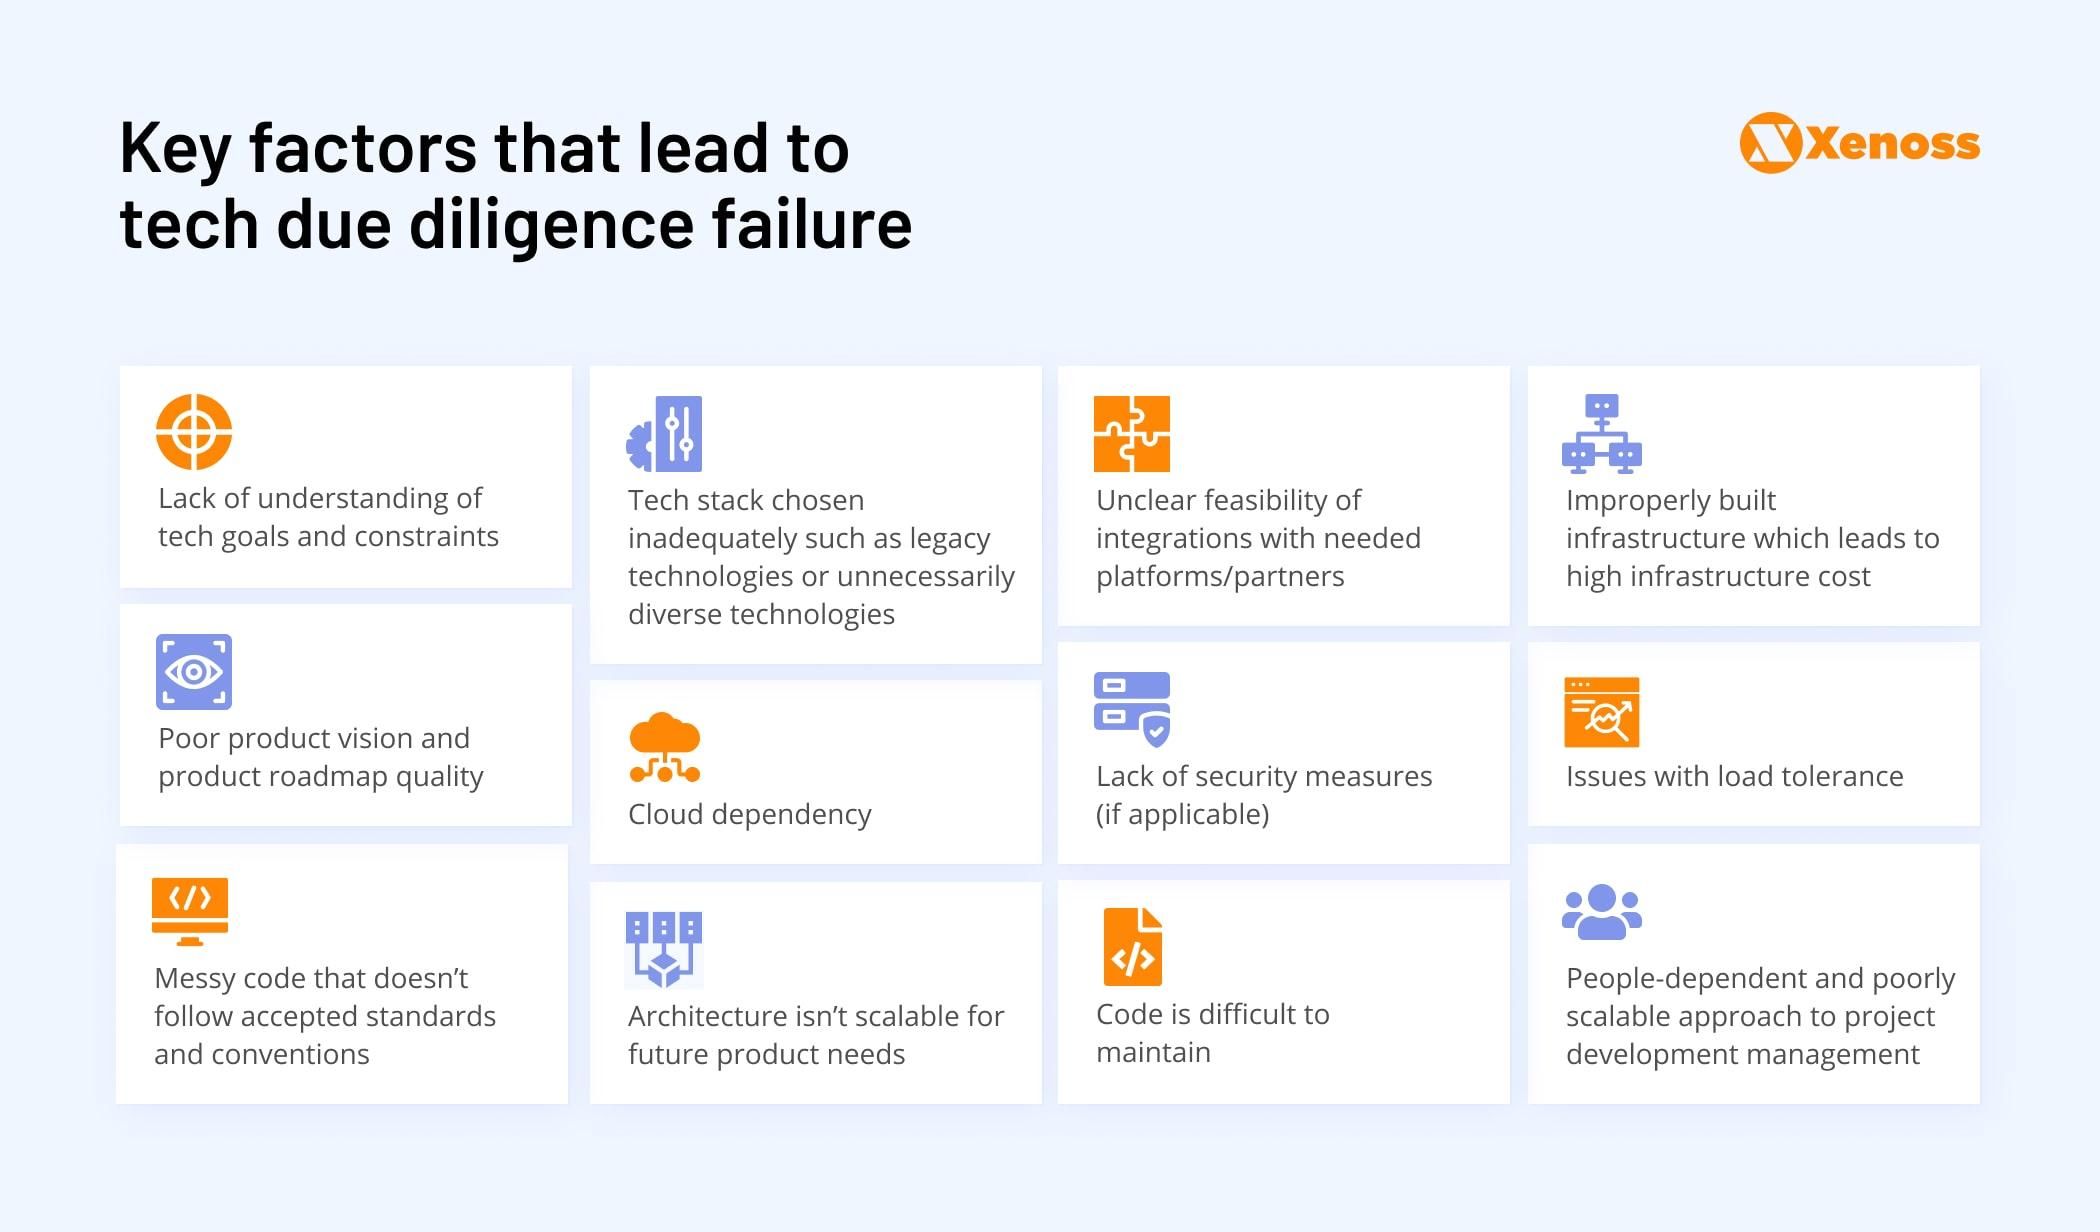 Technical due diligence failure factors   Xenoss Blog